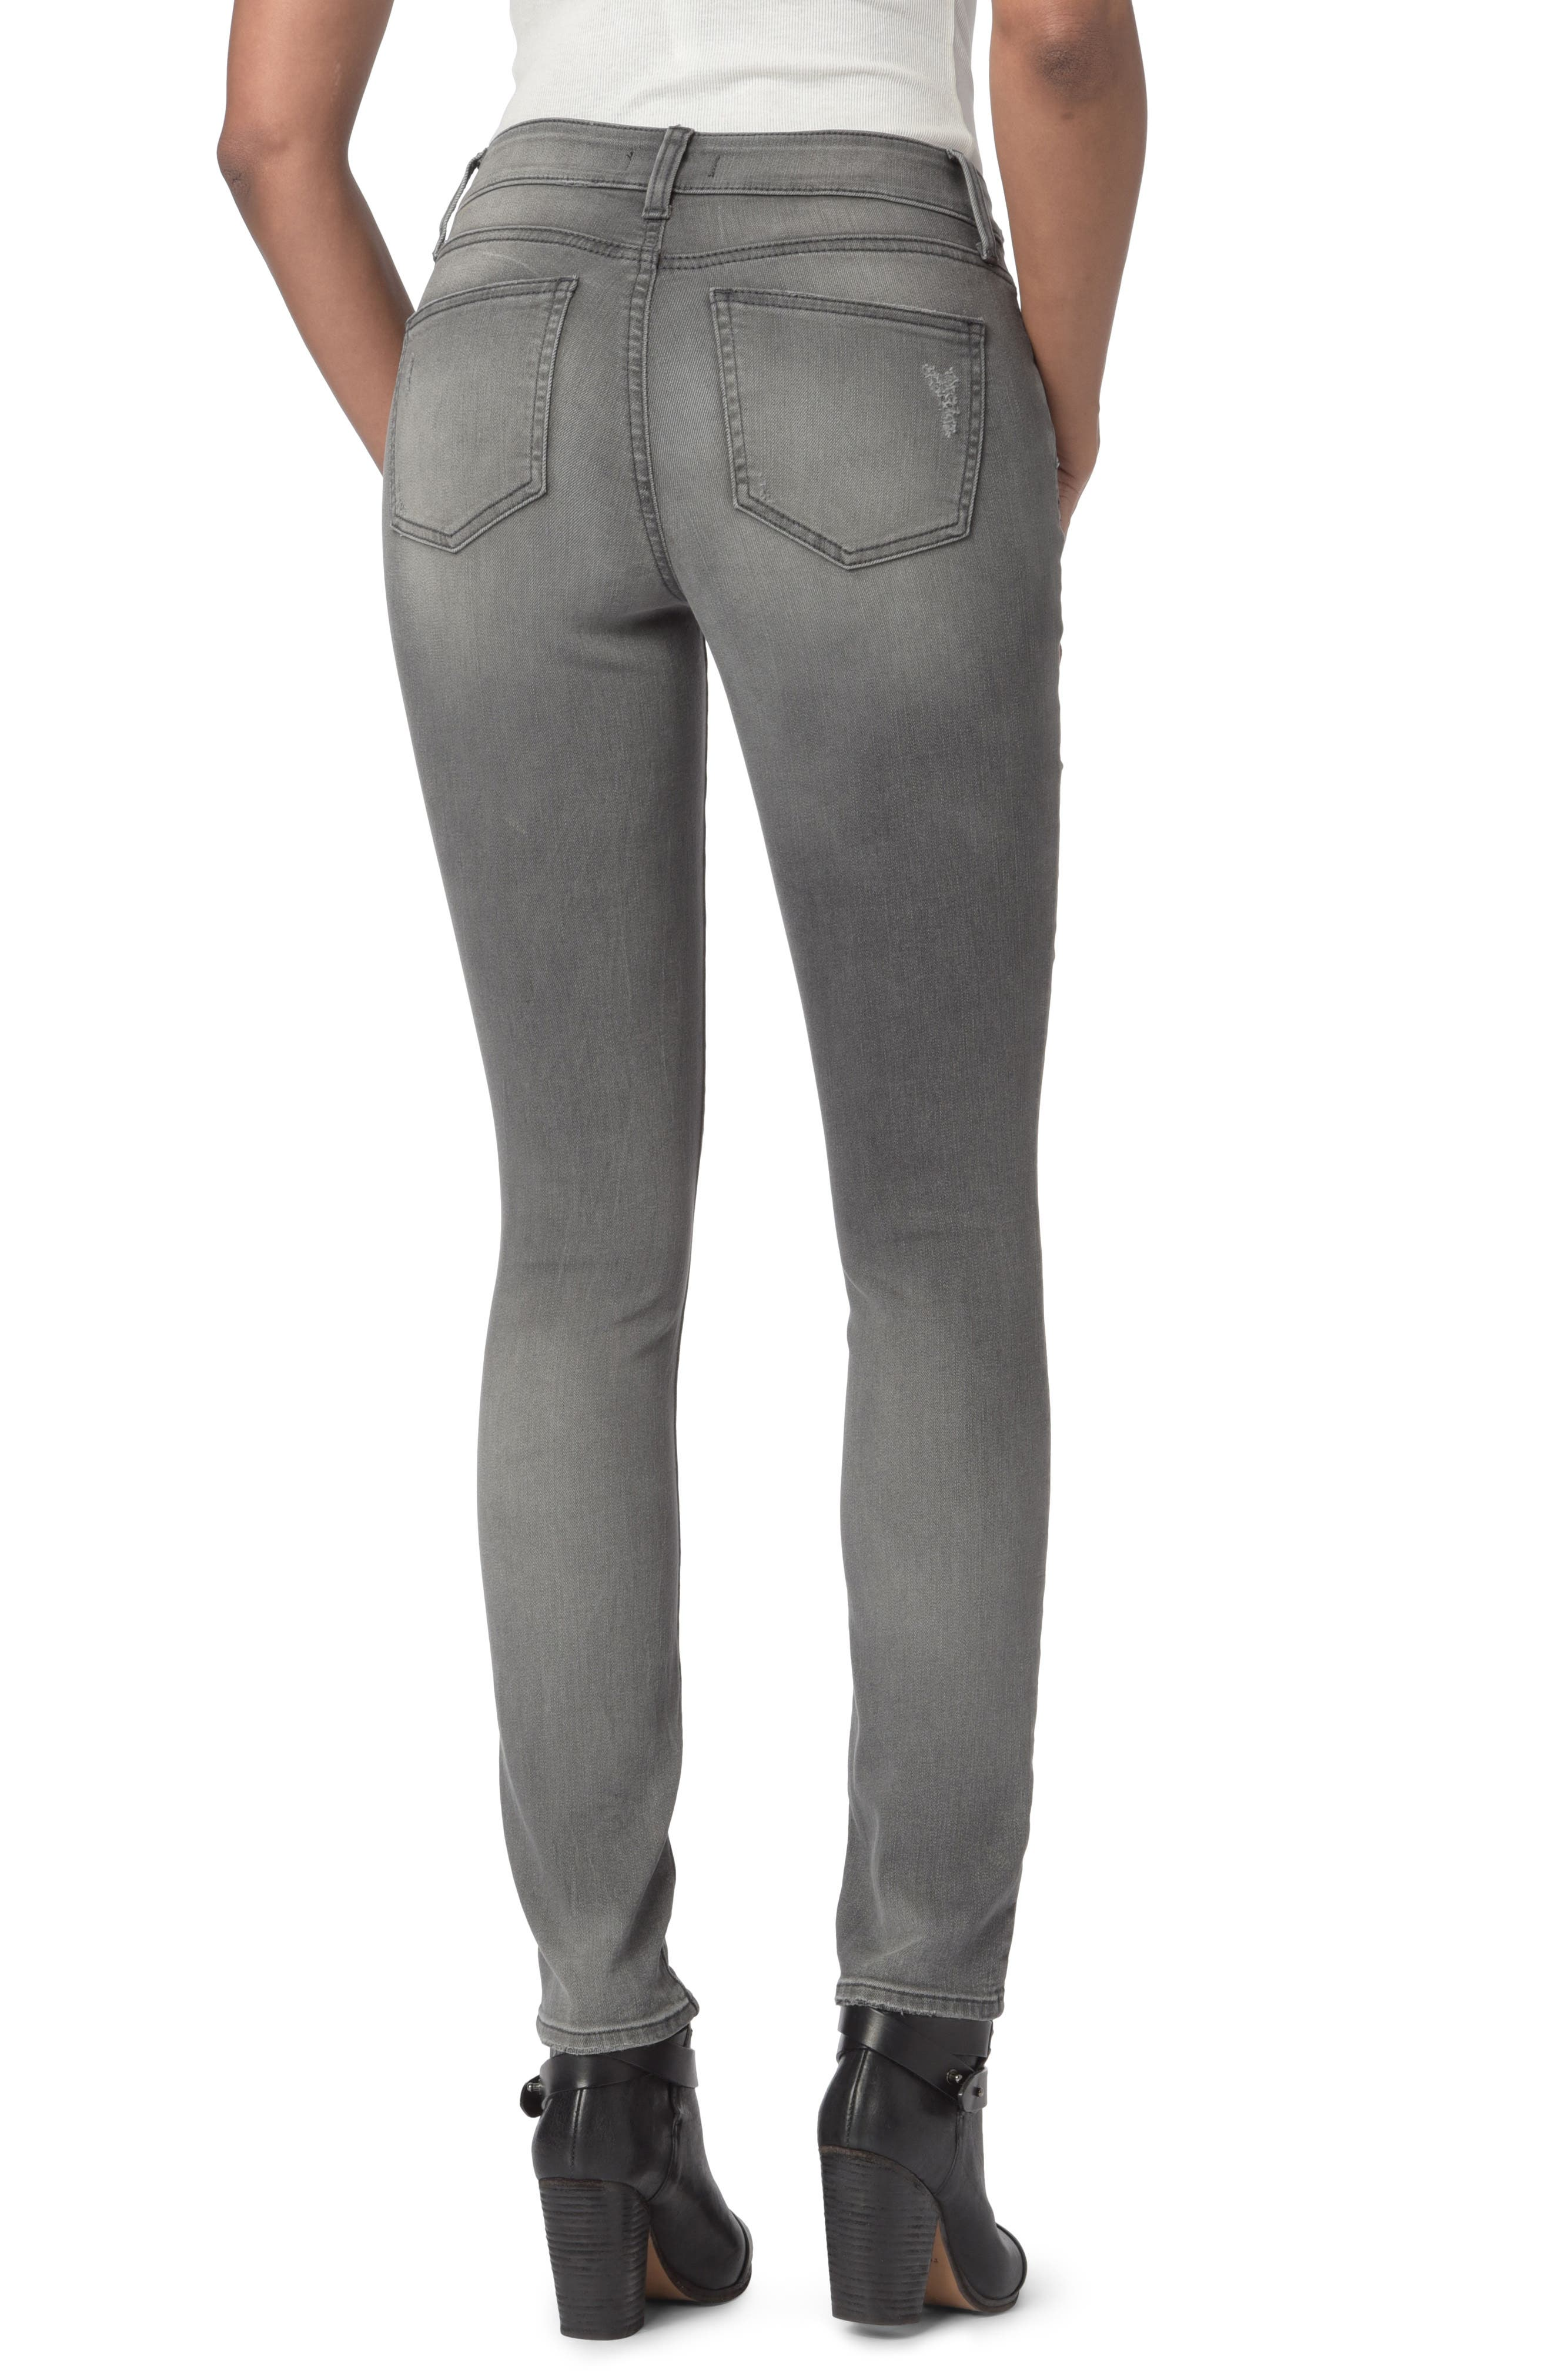 Alina Zippered Legging Jeans,                             Alternate thumbnail 2, color,                             Alchemy